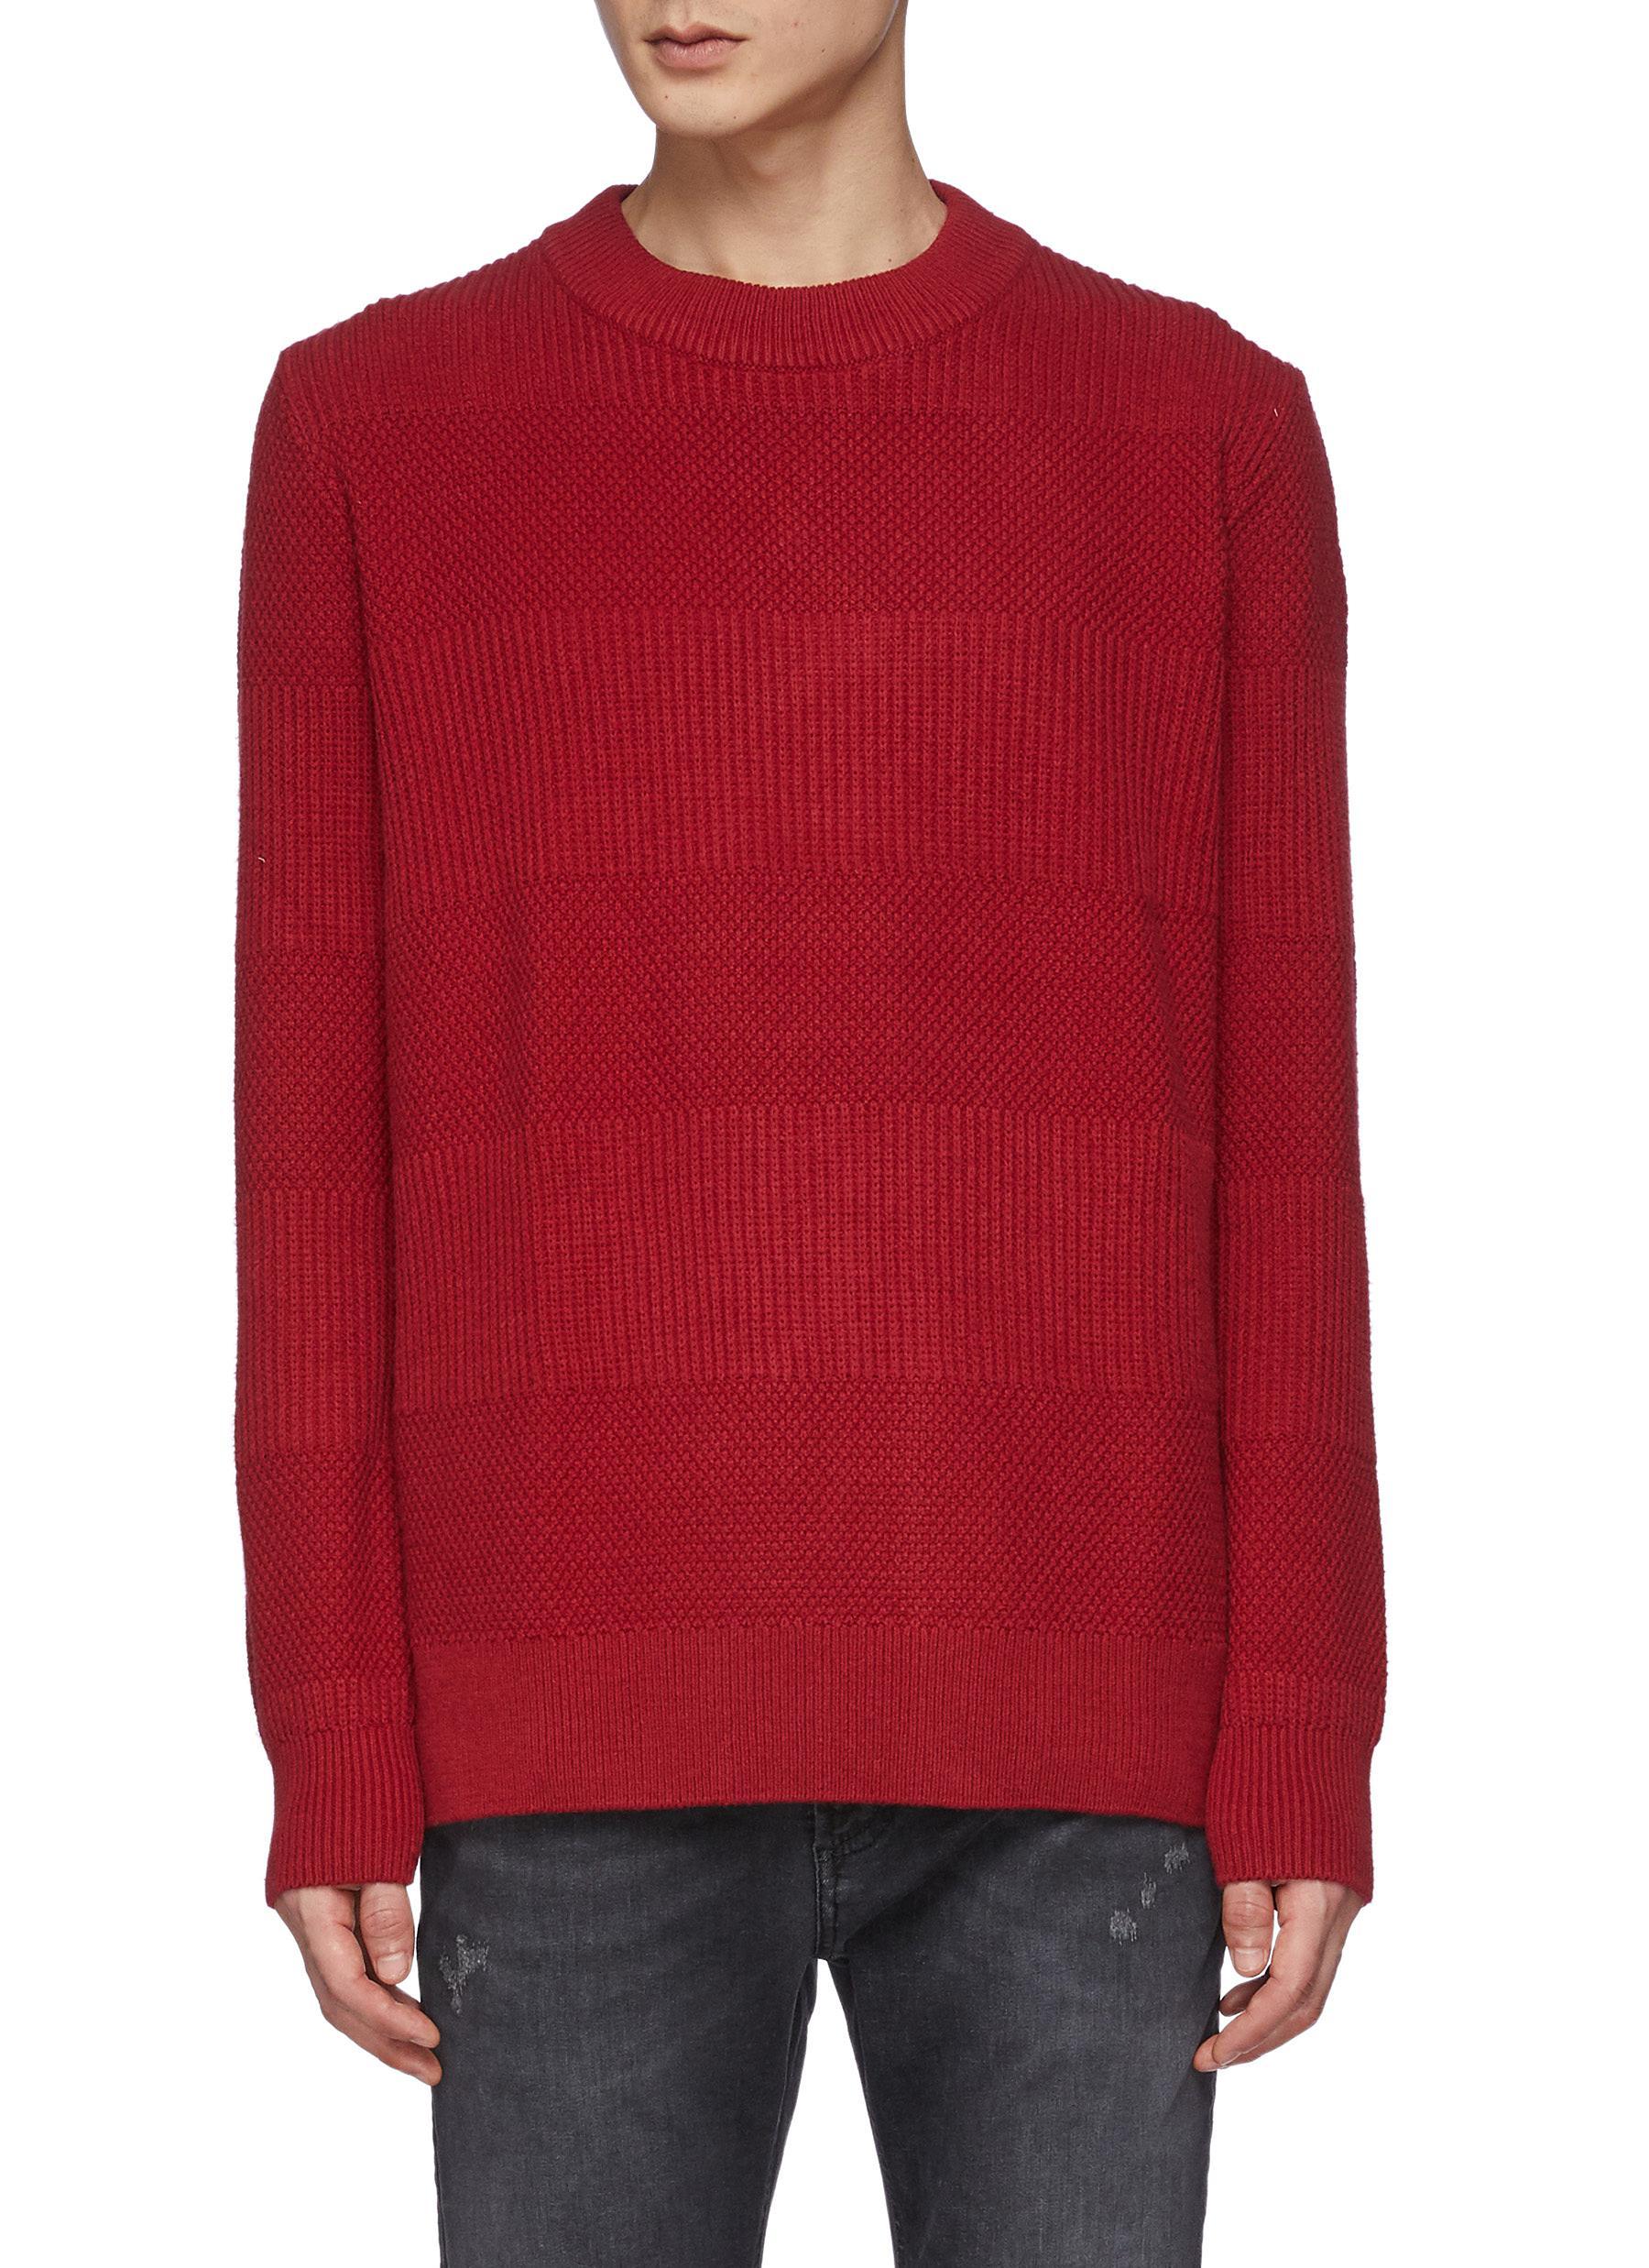 Coldane Knitted Stripe Sweater